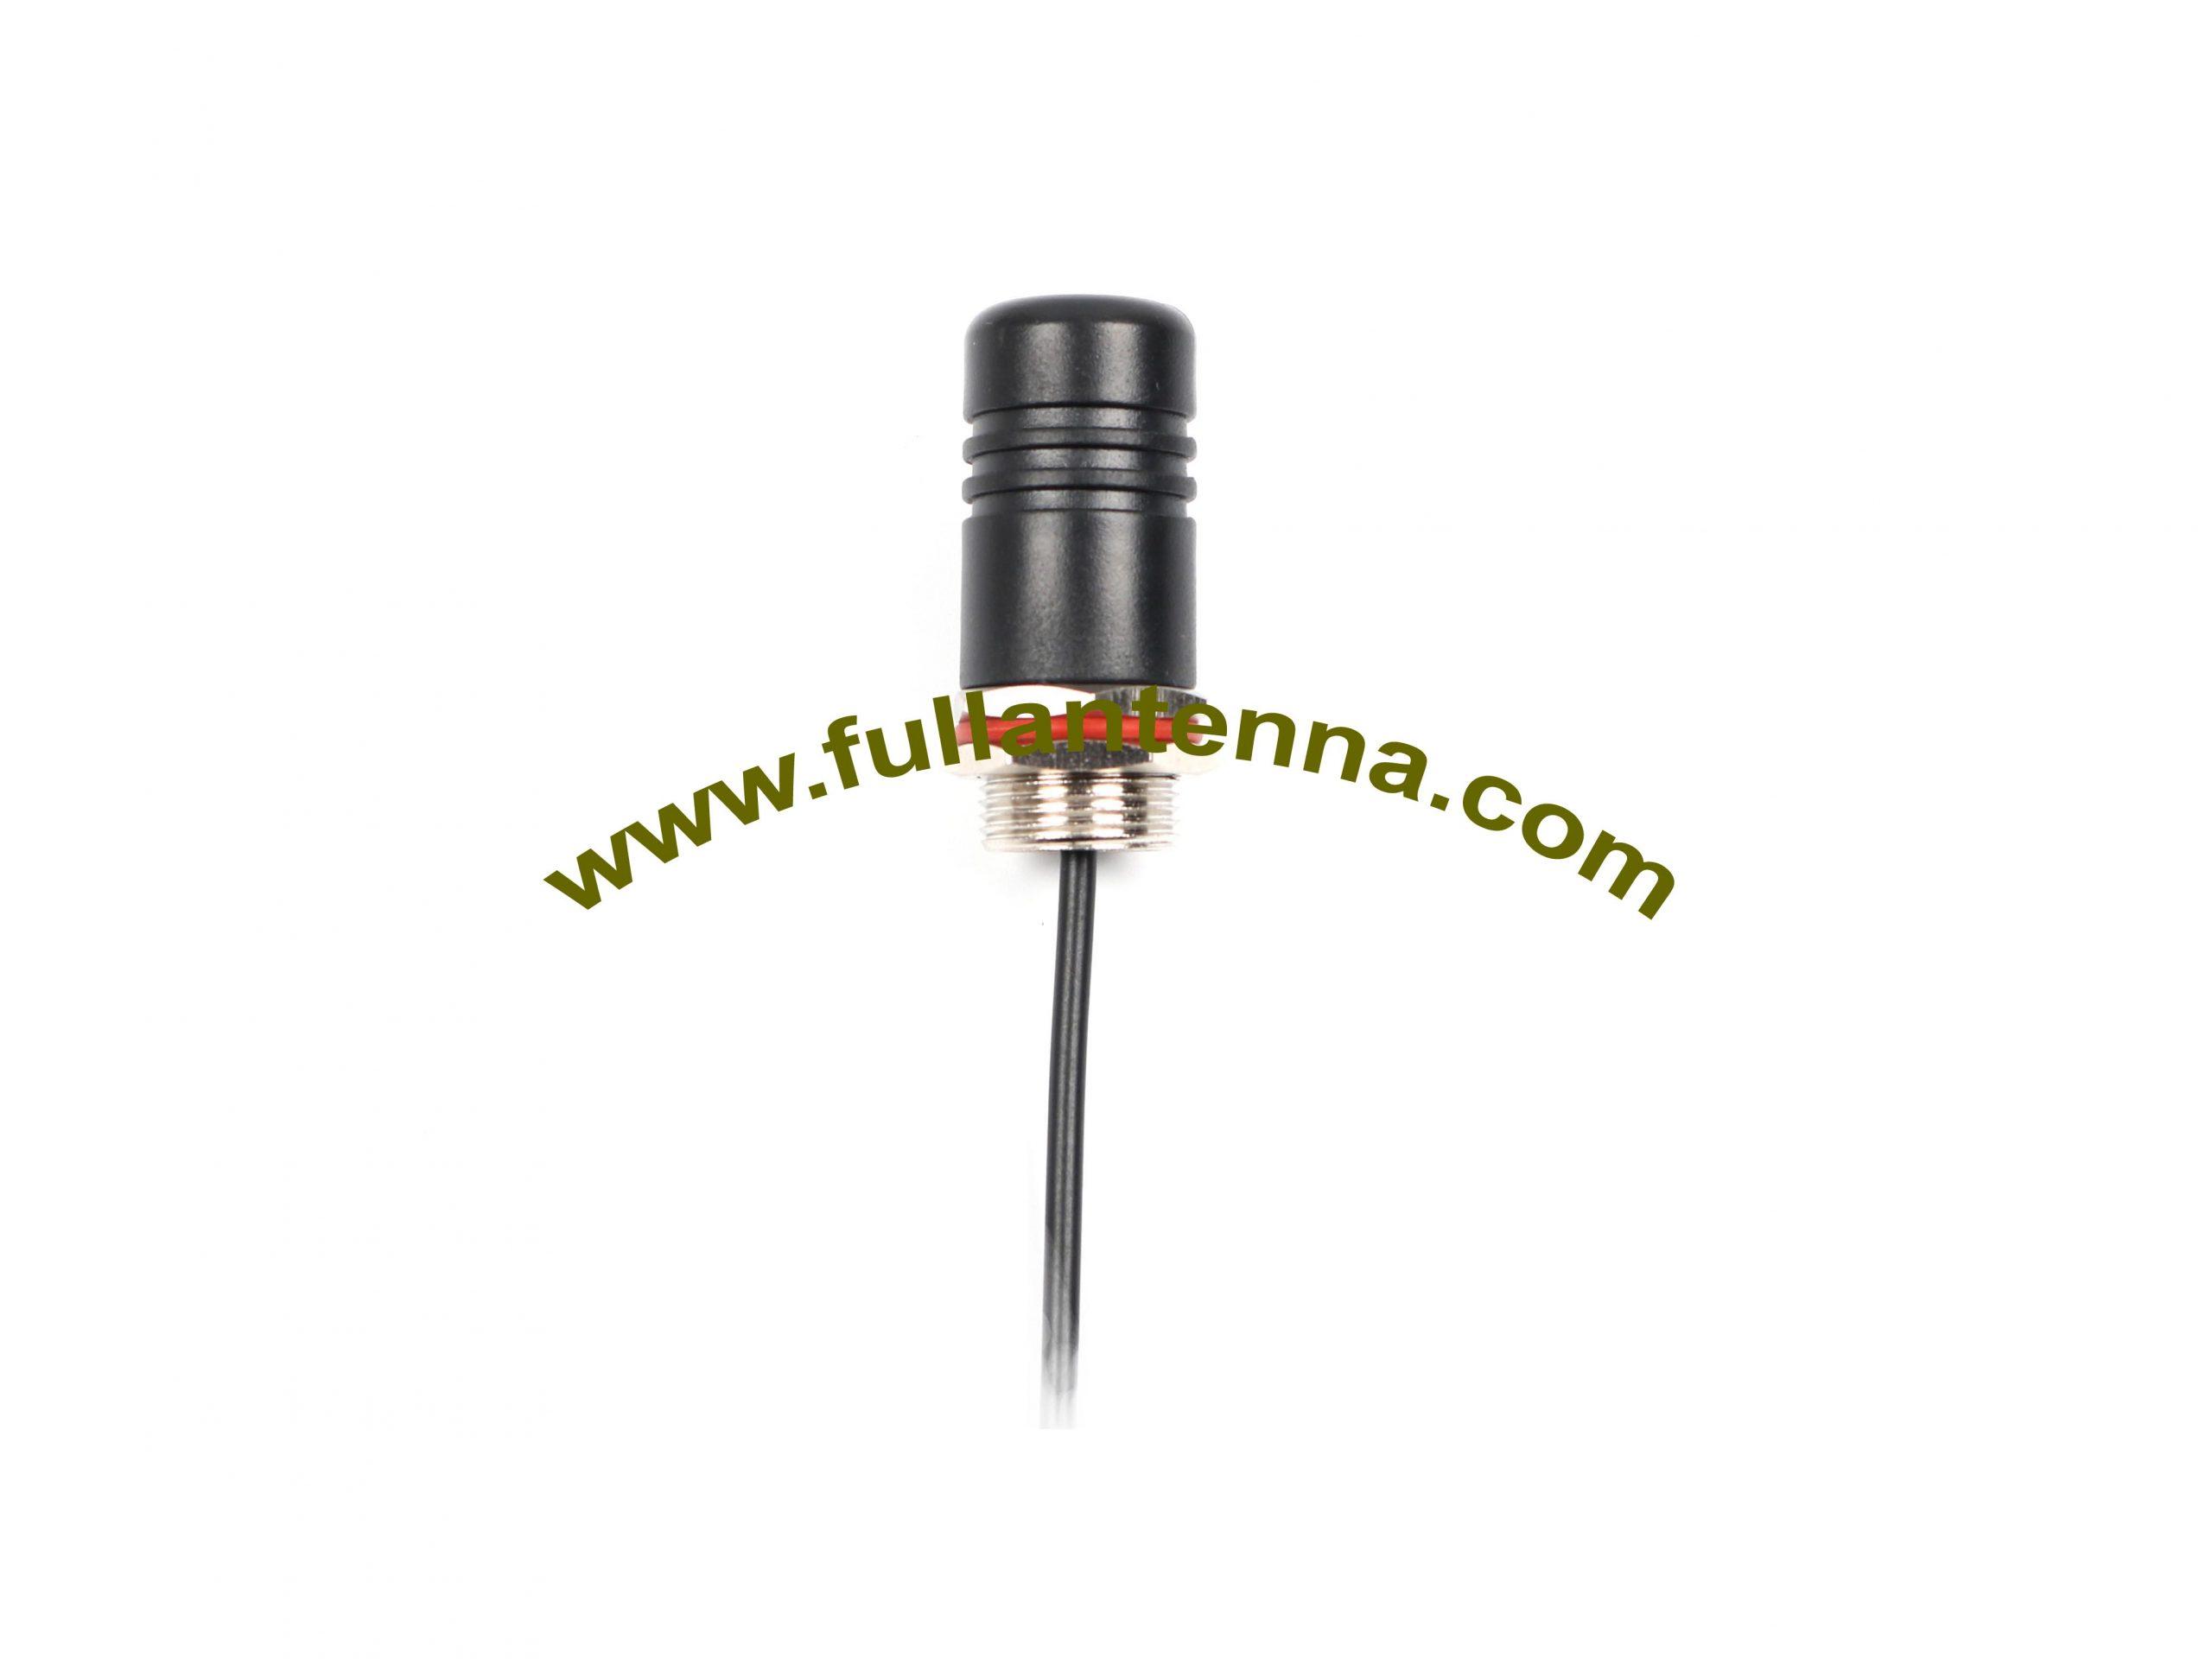 P/N:FA2400.0301,WiFi/2.4G External Antenna,2400-2500mhz frequency,screw mount